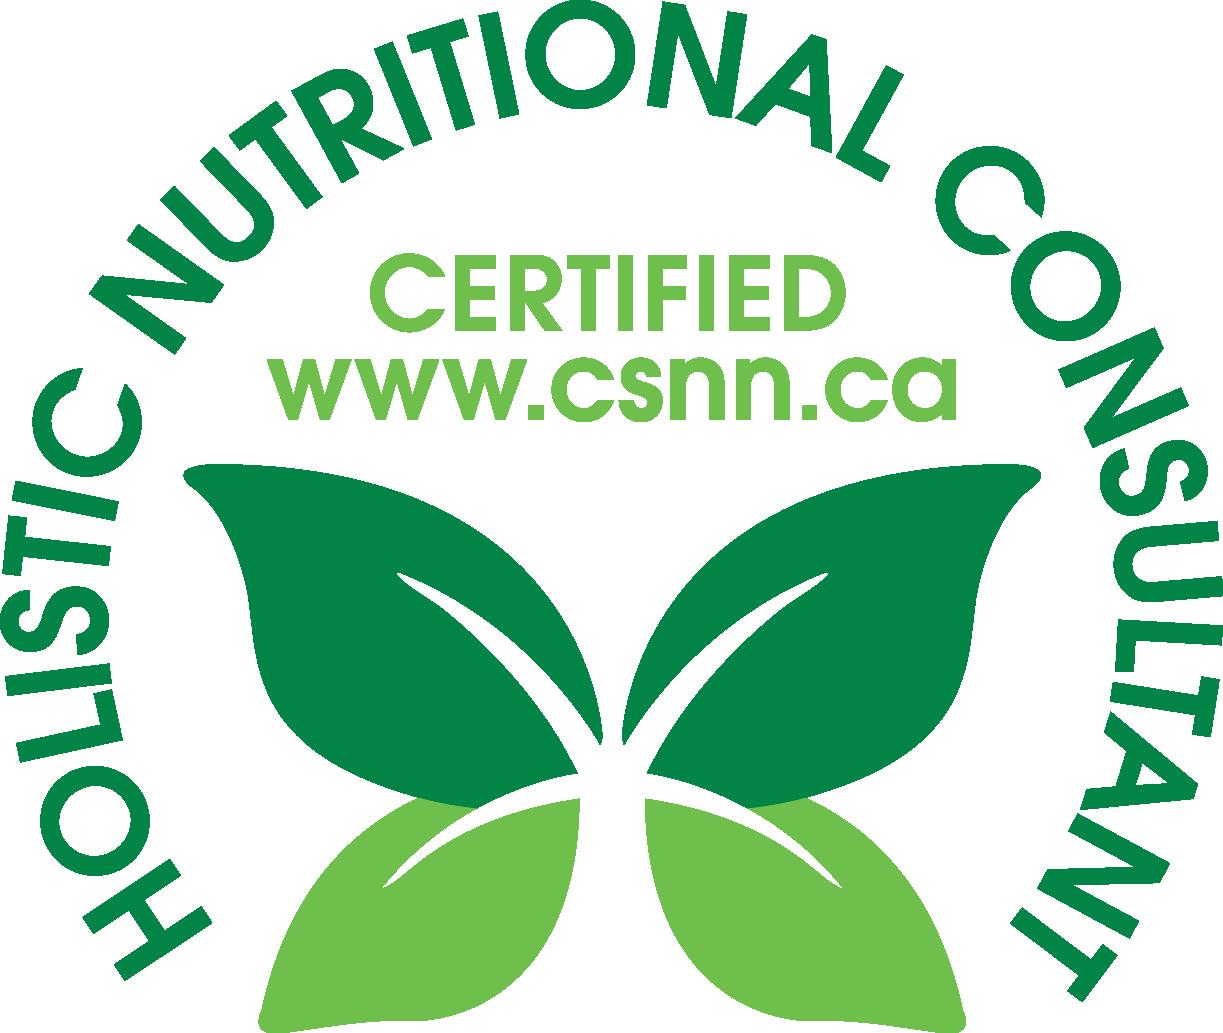 csnn nutritionist certification